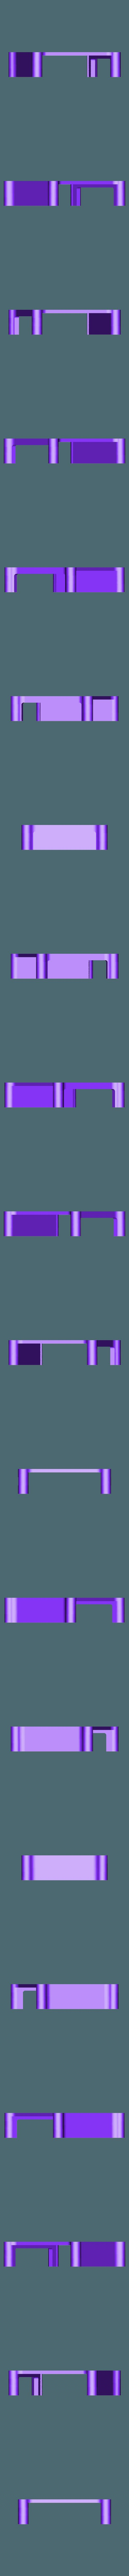 Pi Holder v1 v30.stl Download STL file Arduino RaspBerry Pi Rasbian On Site Programmer • 3D printer template, nik101968